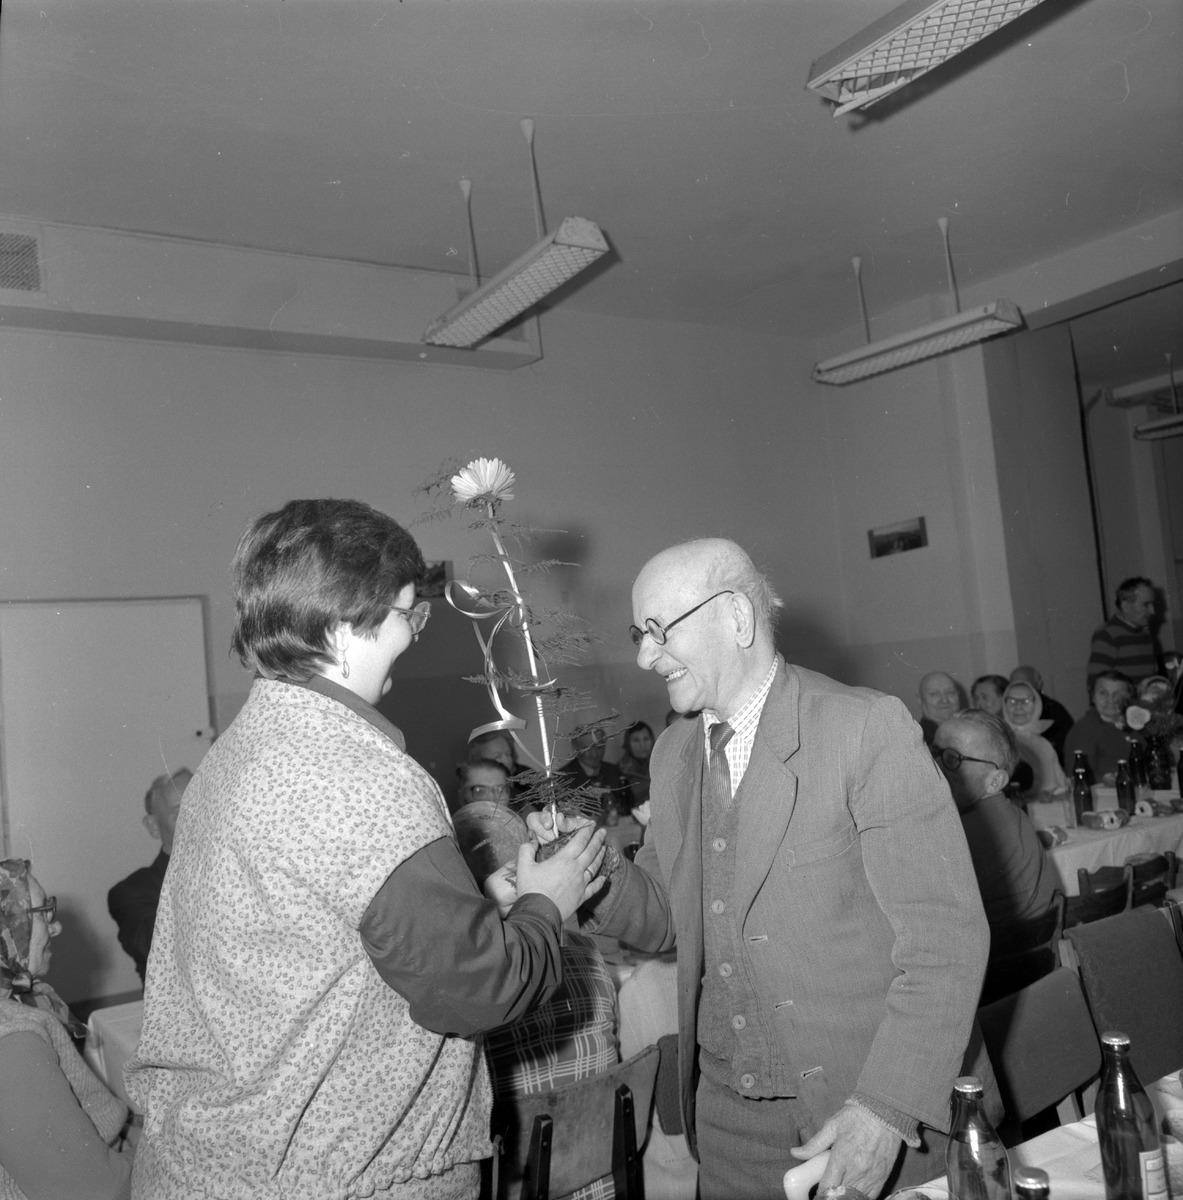 Obchody Dnia Seniora, 1985 r. [3]